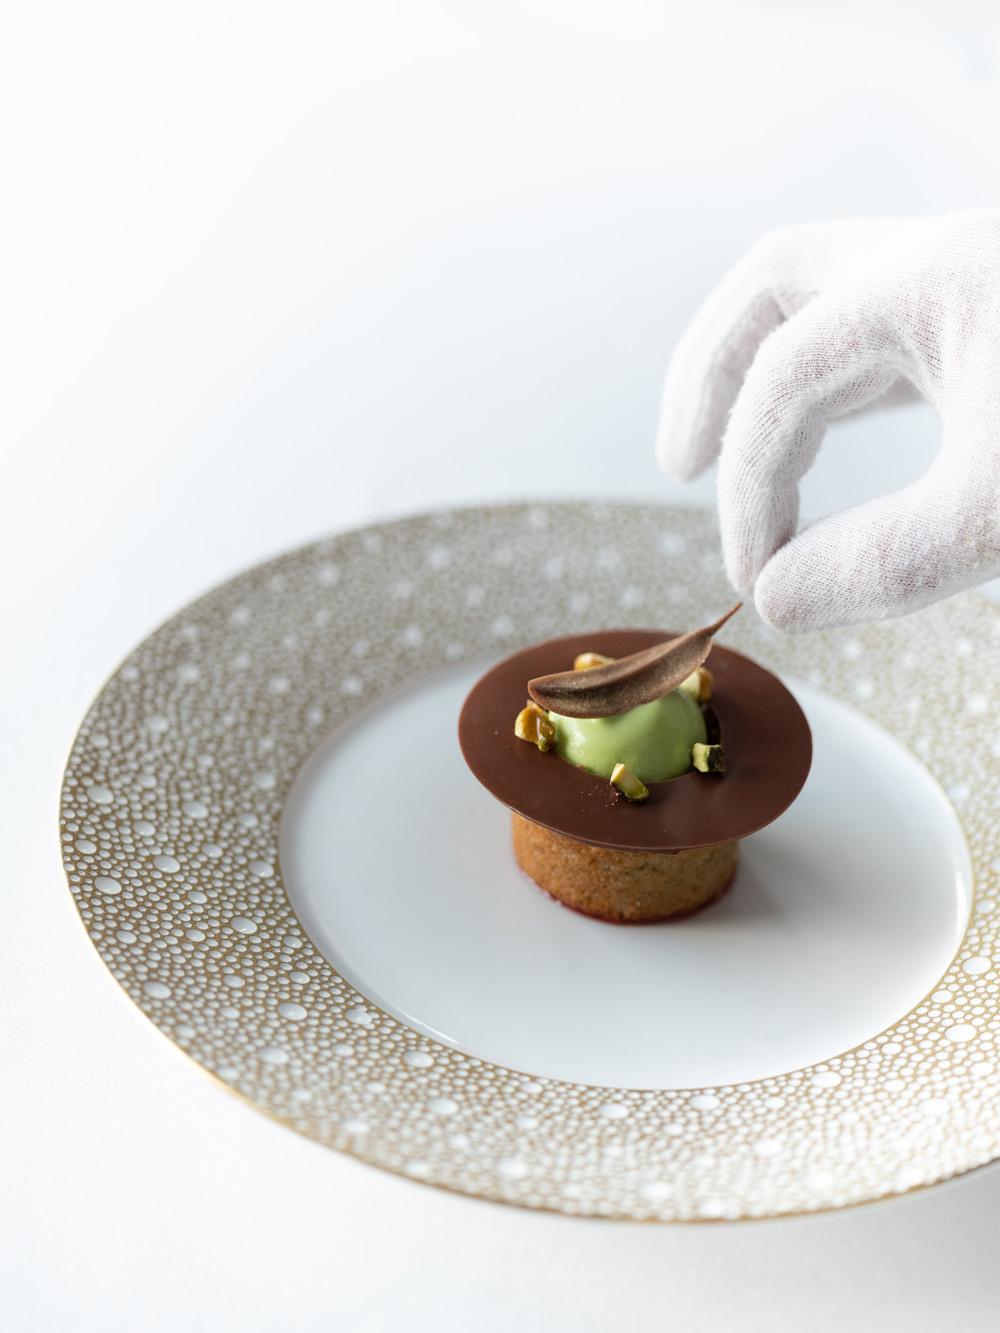 Alaise restaurant dessert fotograf mats dreyer stylist oslo michelin star